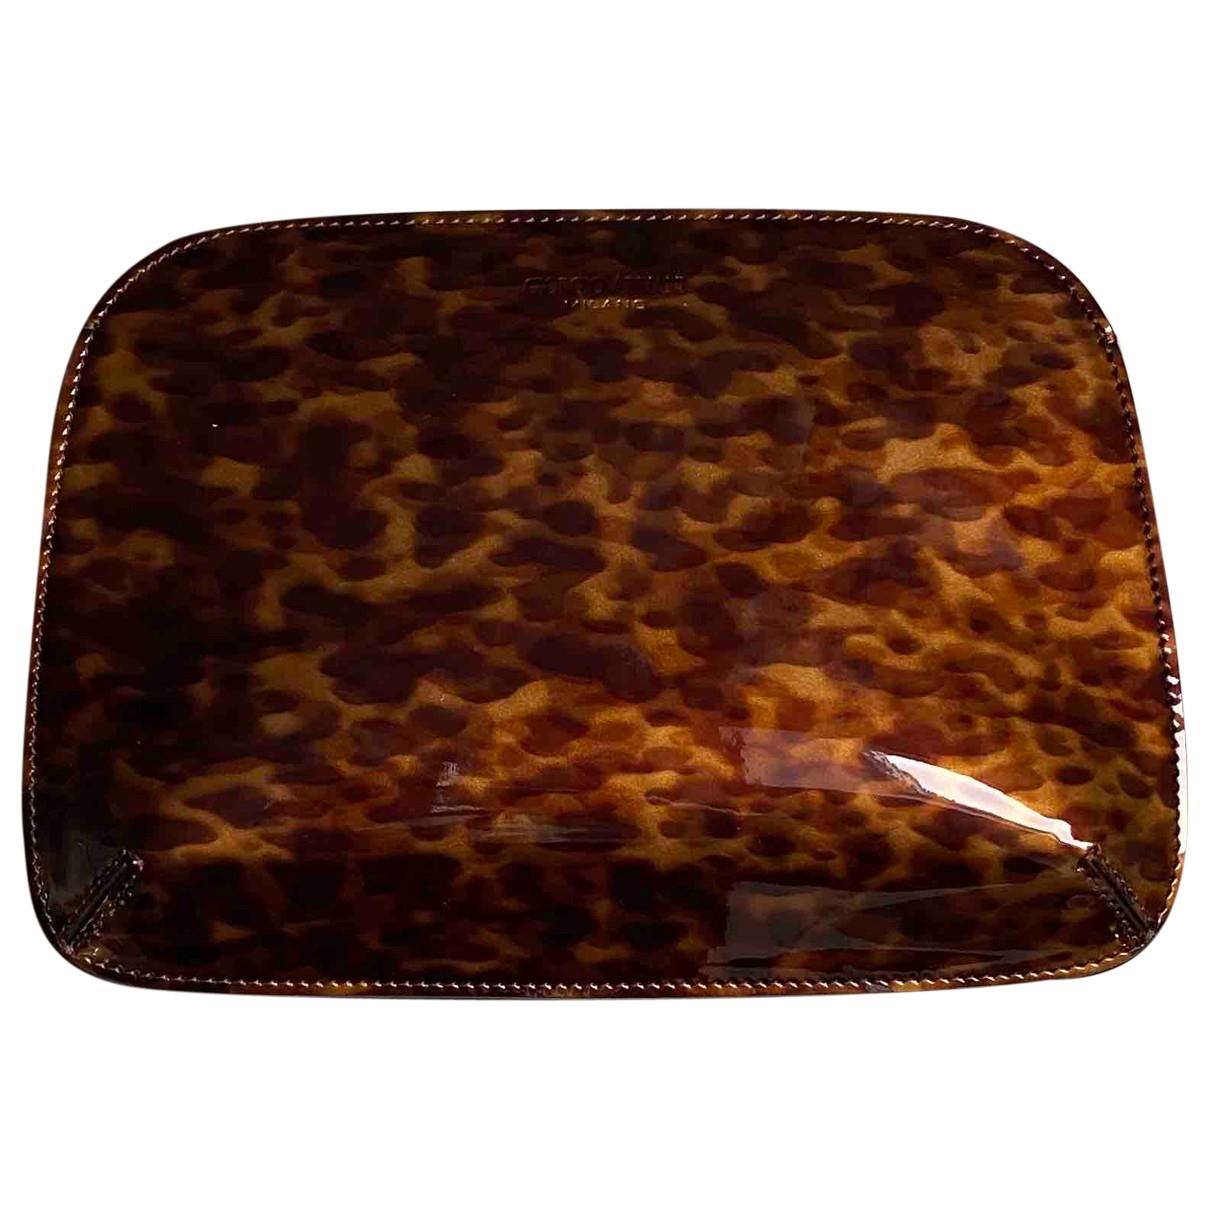 Giorgio Armani \N Brown Clutch bag for Women \N